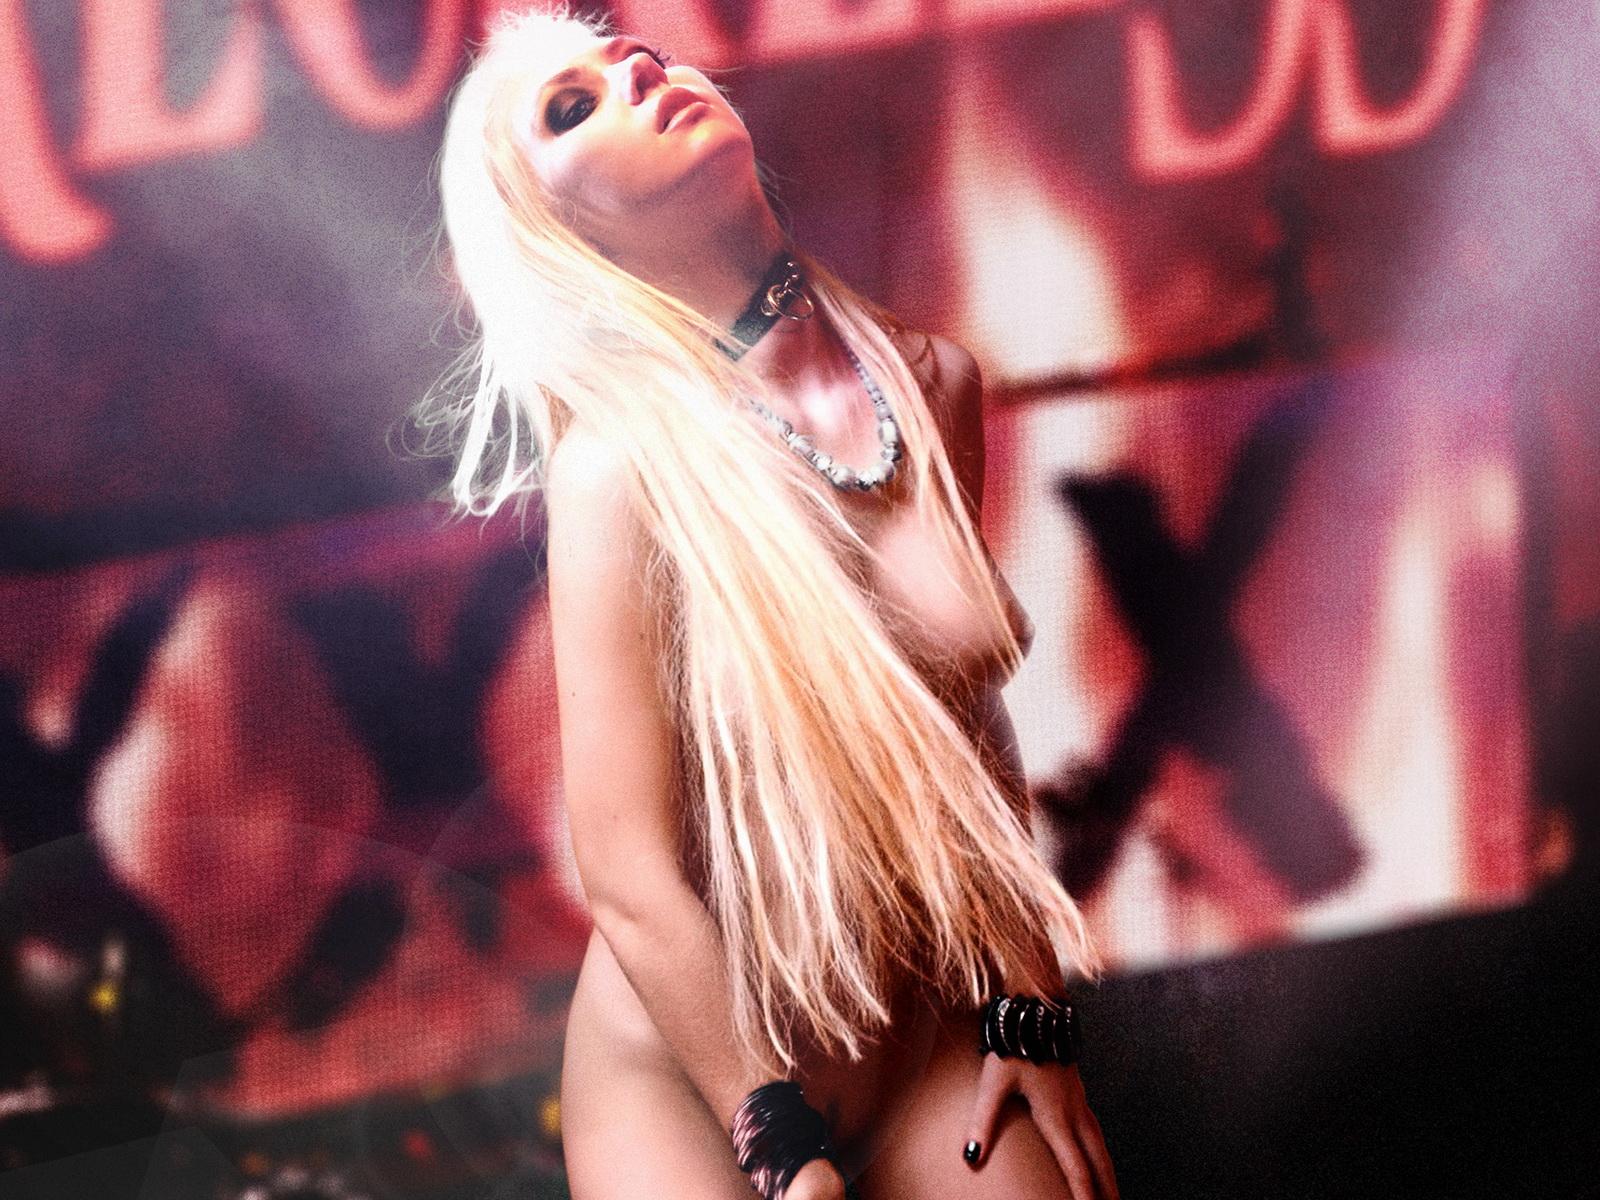 http://1.bp.blogspot.com/-wgsTTL5Dbco/TtHR8qG7jXI/AAAAAAAAC9o/YYshetZJv1o/s1600/Taylor+Momsen+naked+on+stage+grabbing+herself.jpg